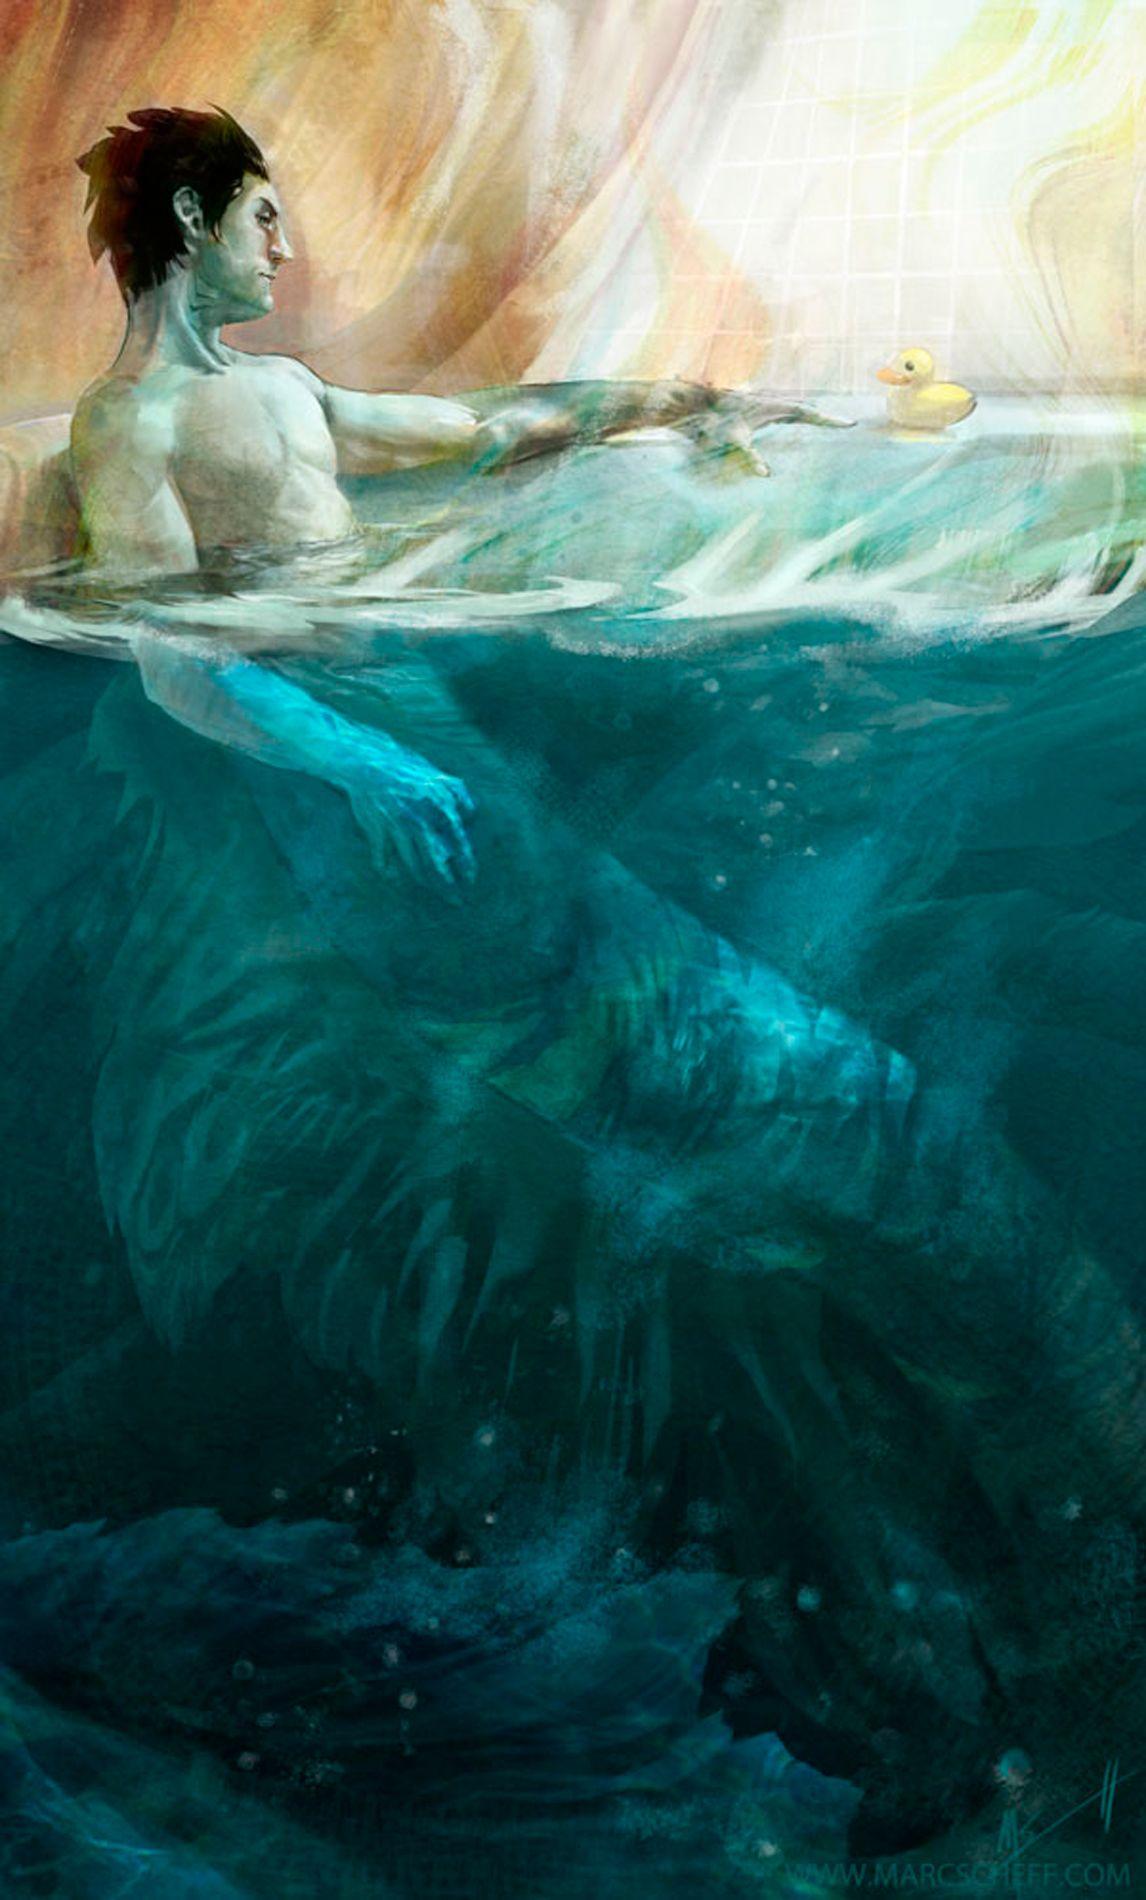 Hidden Depths Merman And Rubber Duckie Marc Scheff Beneath Waves